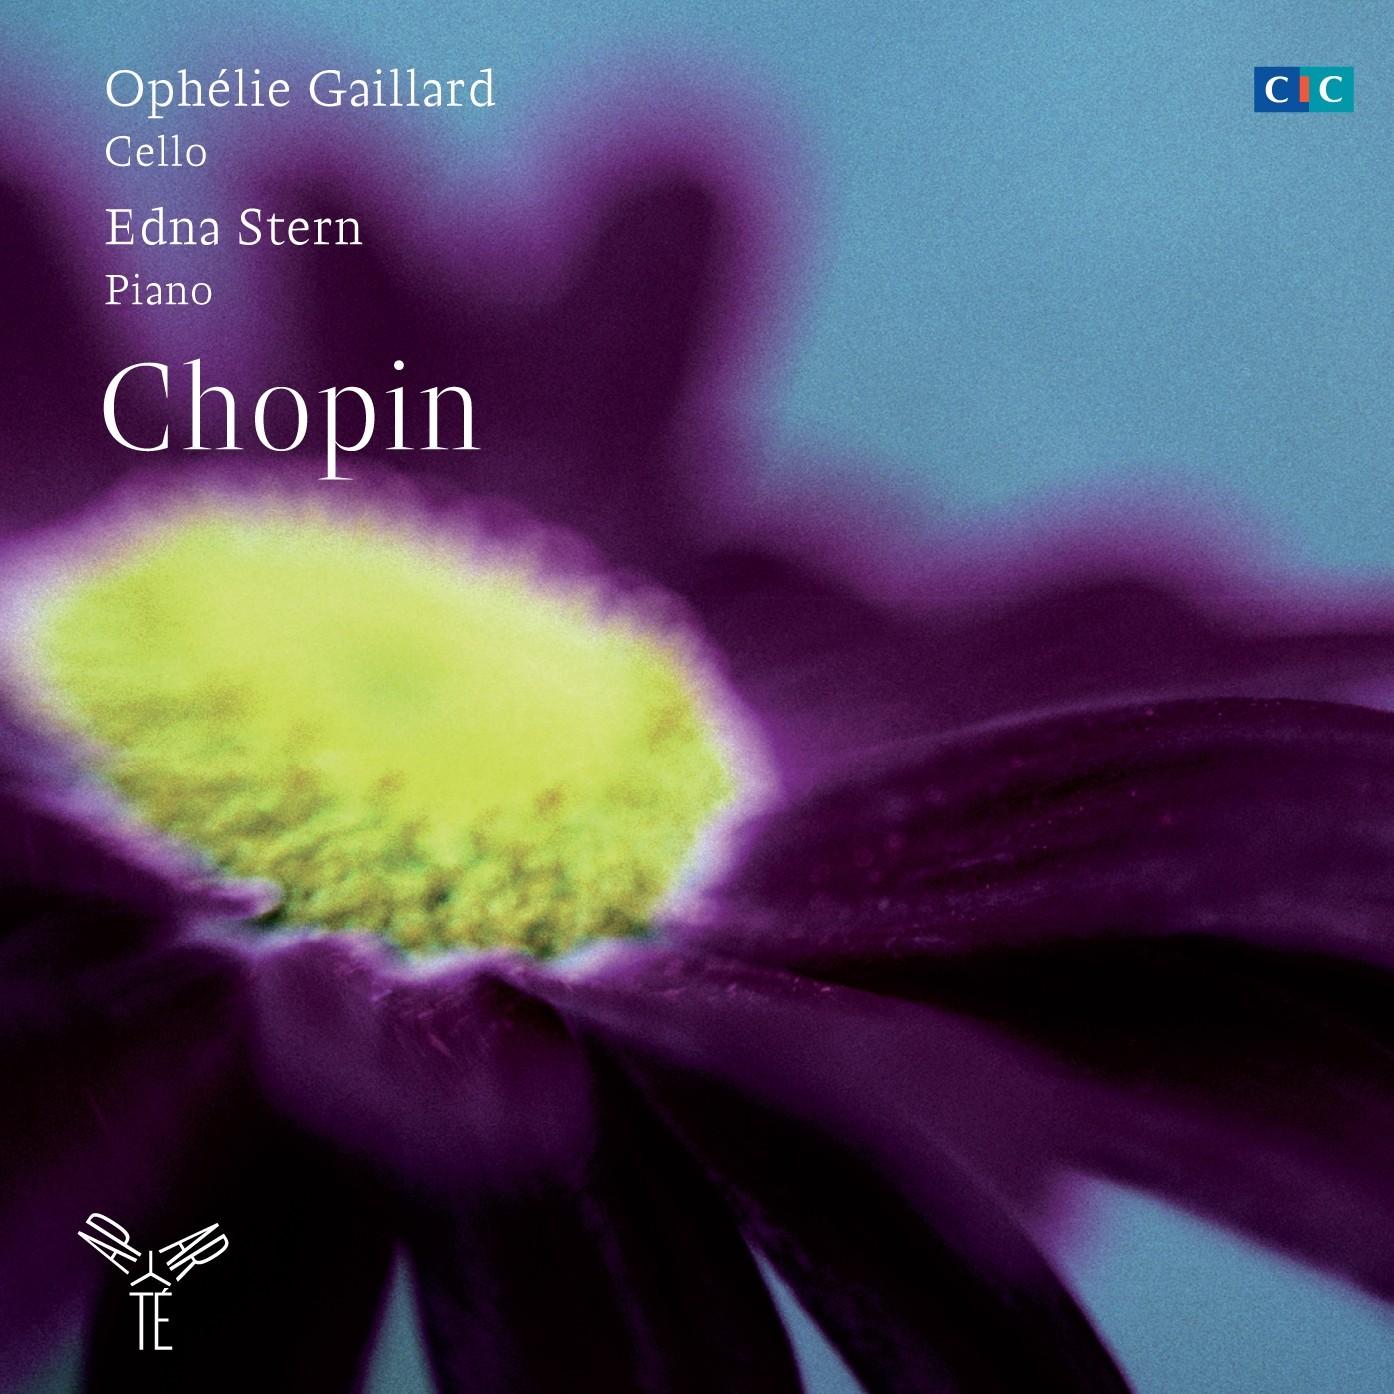 Chopin : Œuvres pour violoncelle & piano